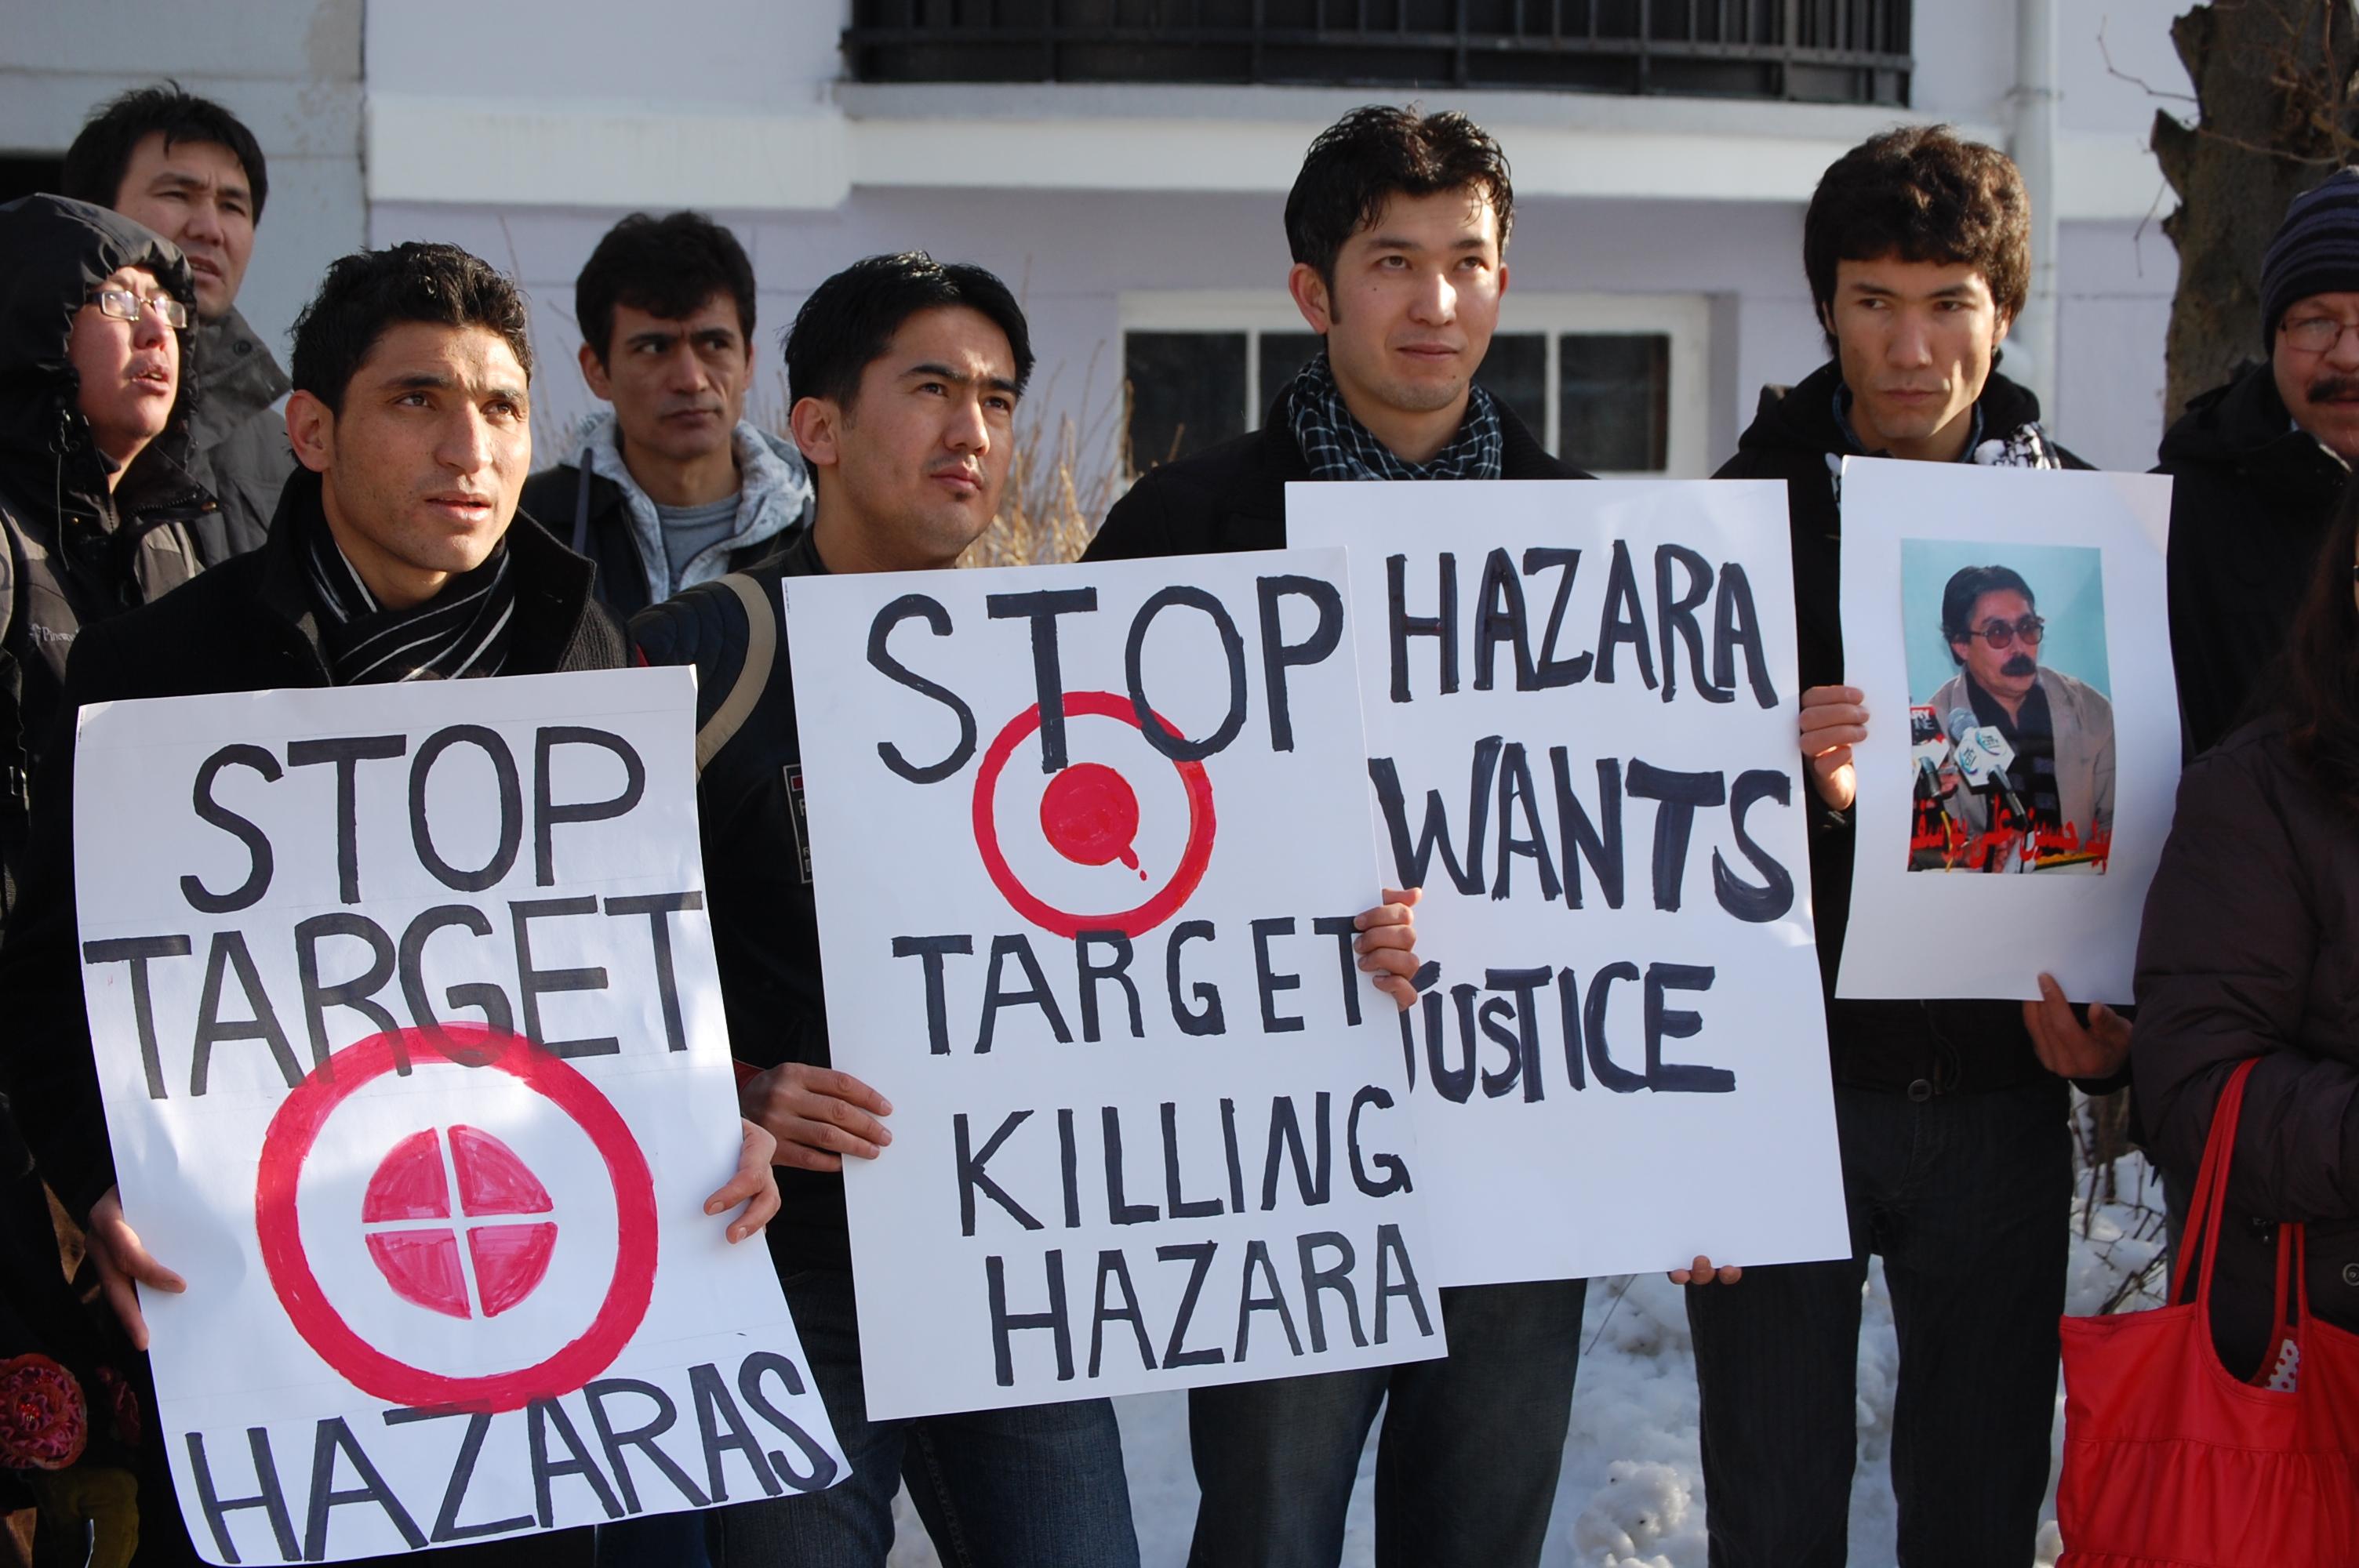 hazara chat in oslo